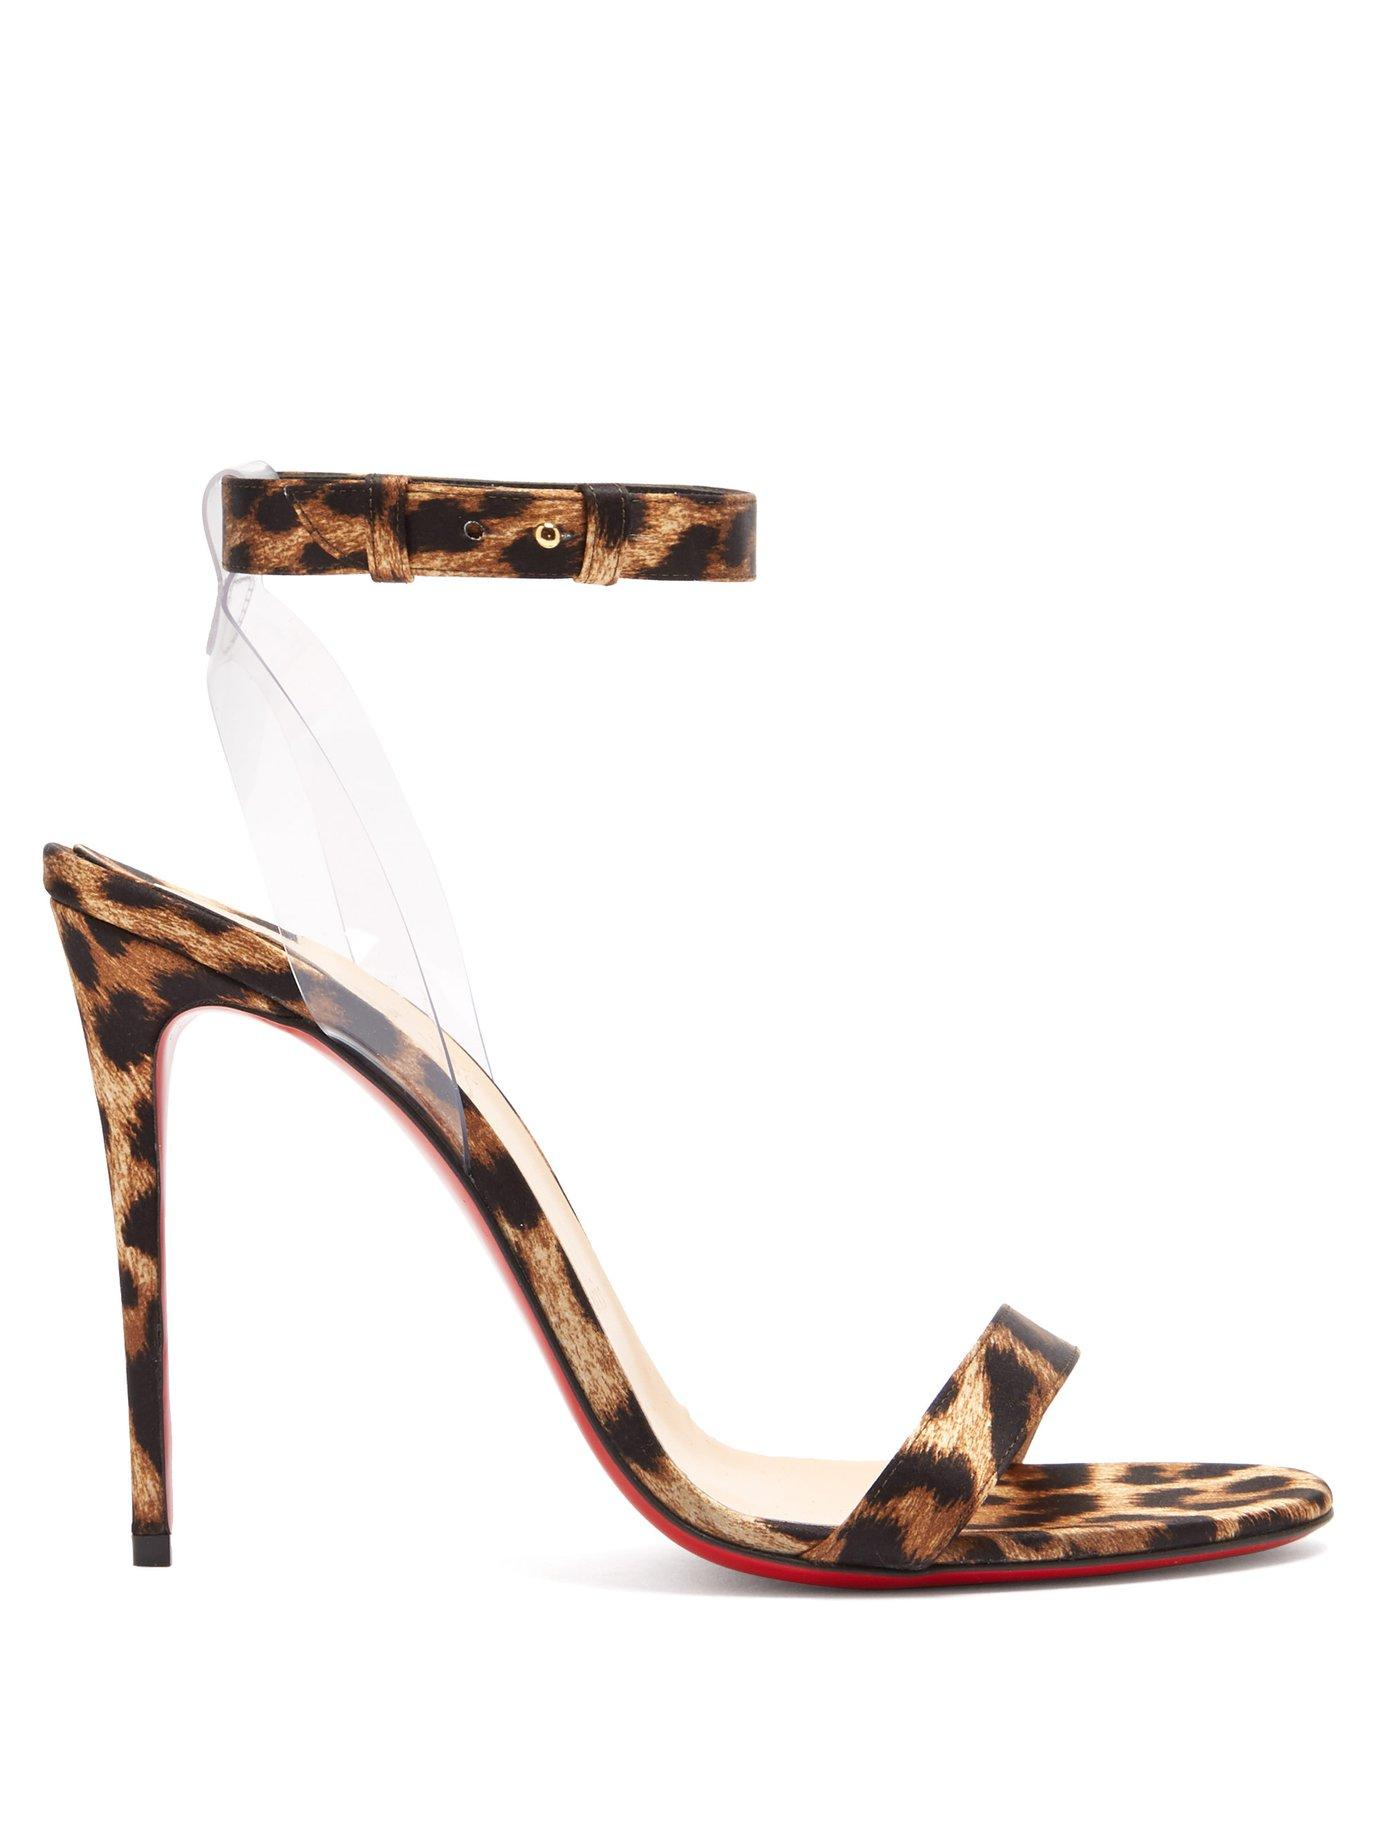 8e1c15cfea30 Christian Louboutin. Women s Brown Jonatina 100 Leopard Print Satin Sandals